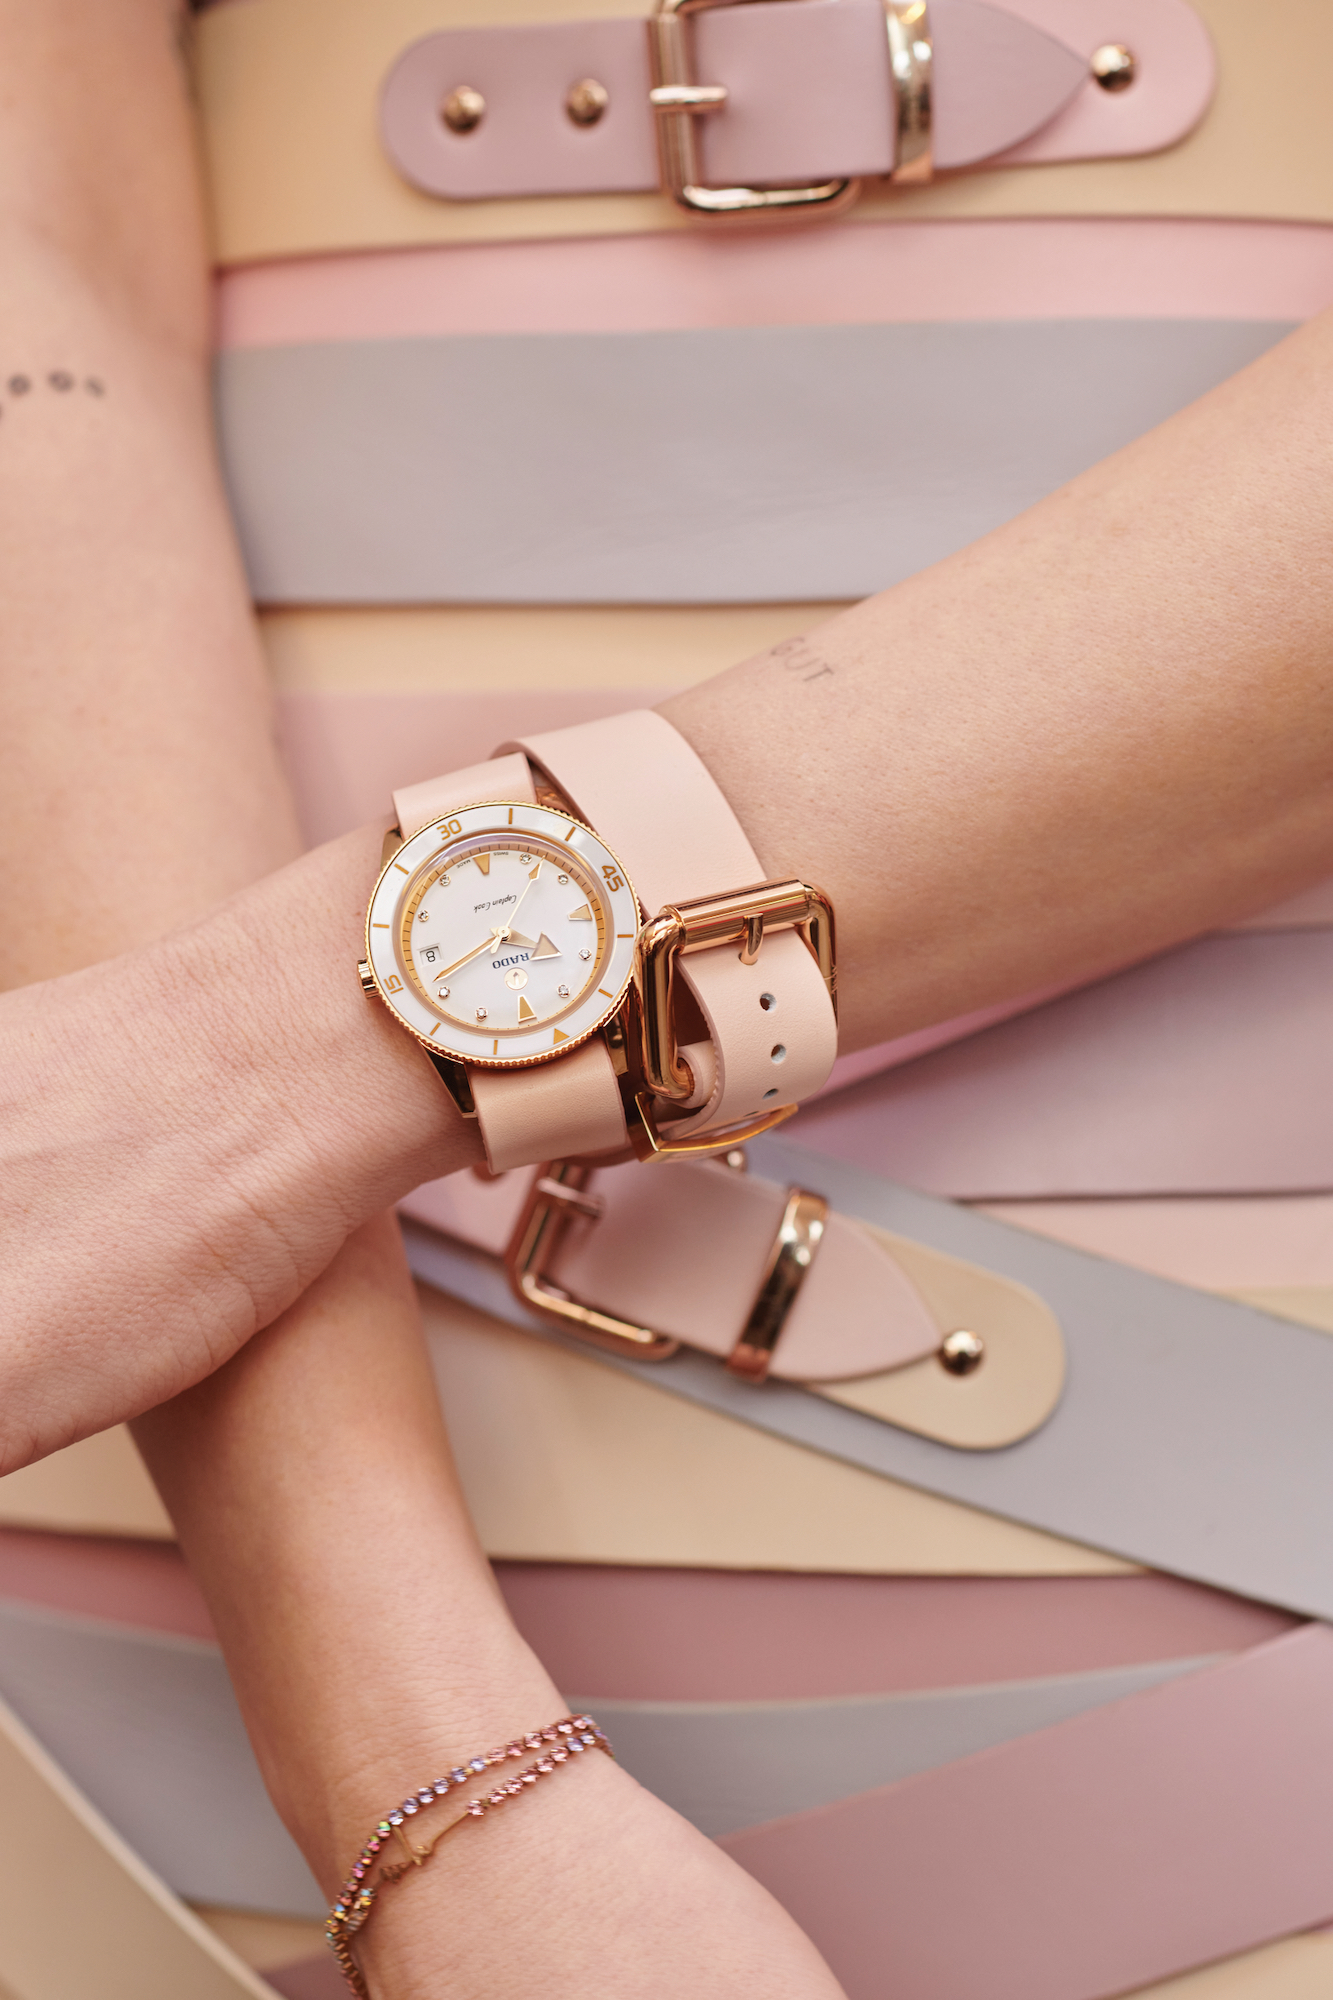 Rado Captain Cook x Marina Hoermanseder 01.763.6139.3.570 Lifestyle wristshot